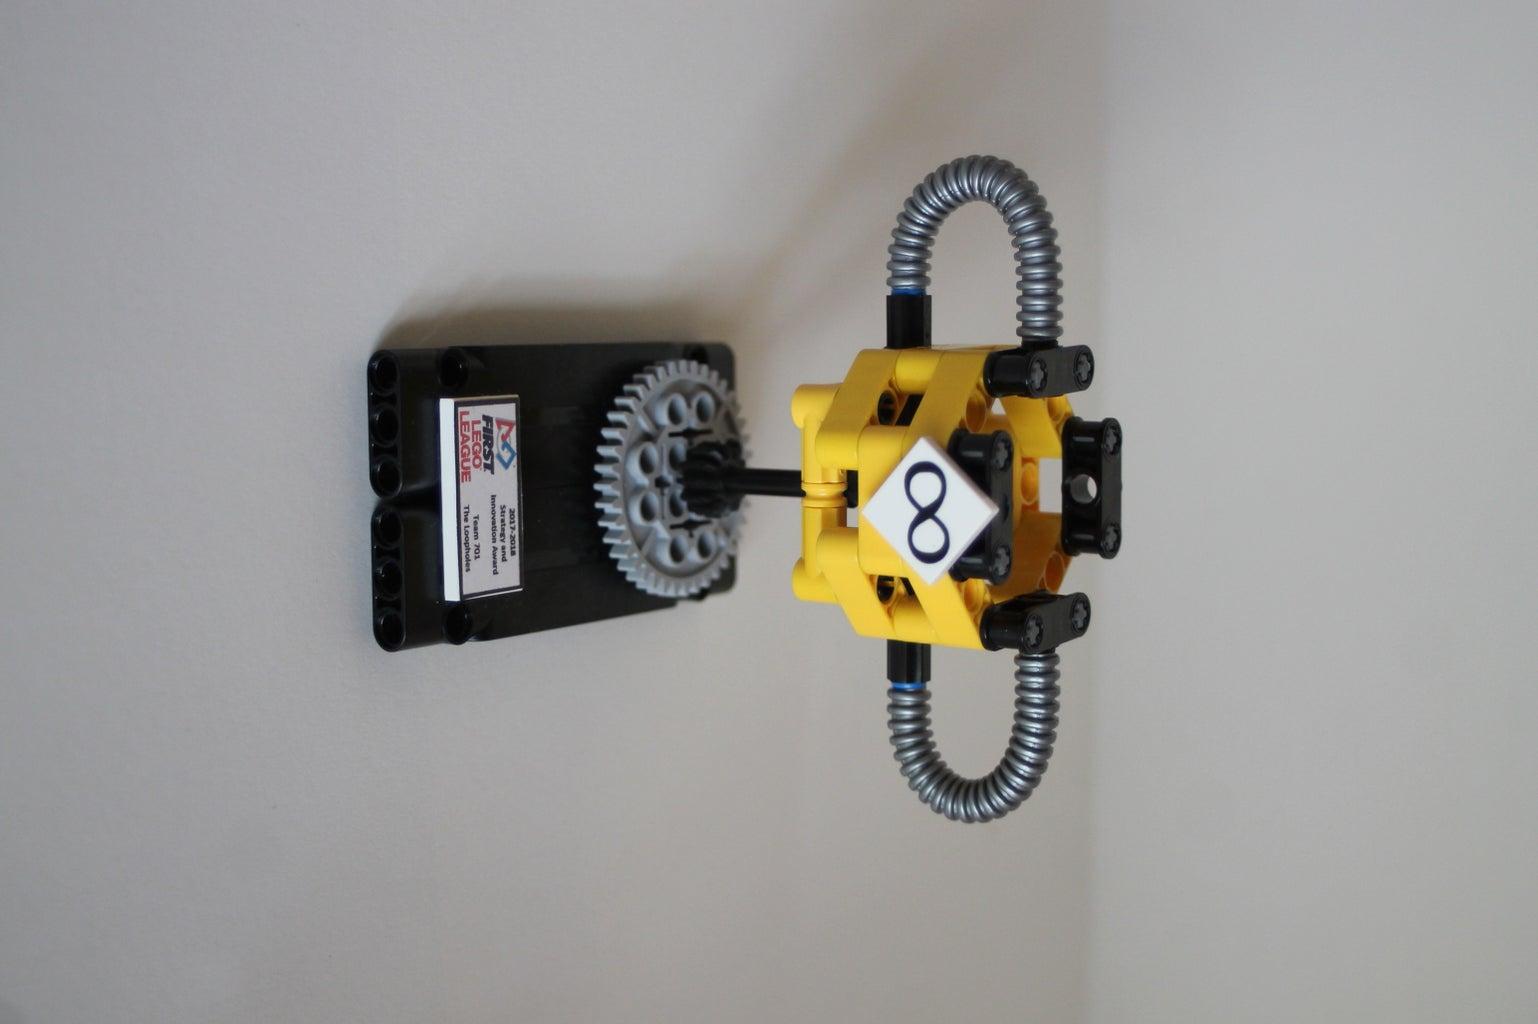 Mini First Lego League Trophy